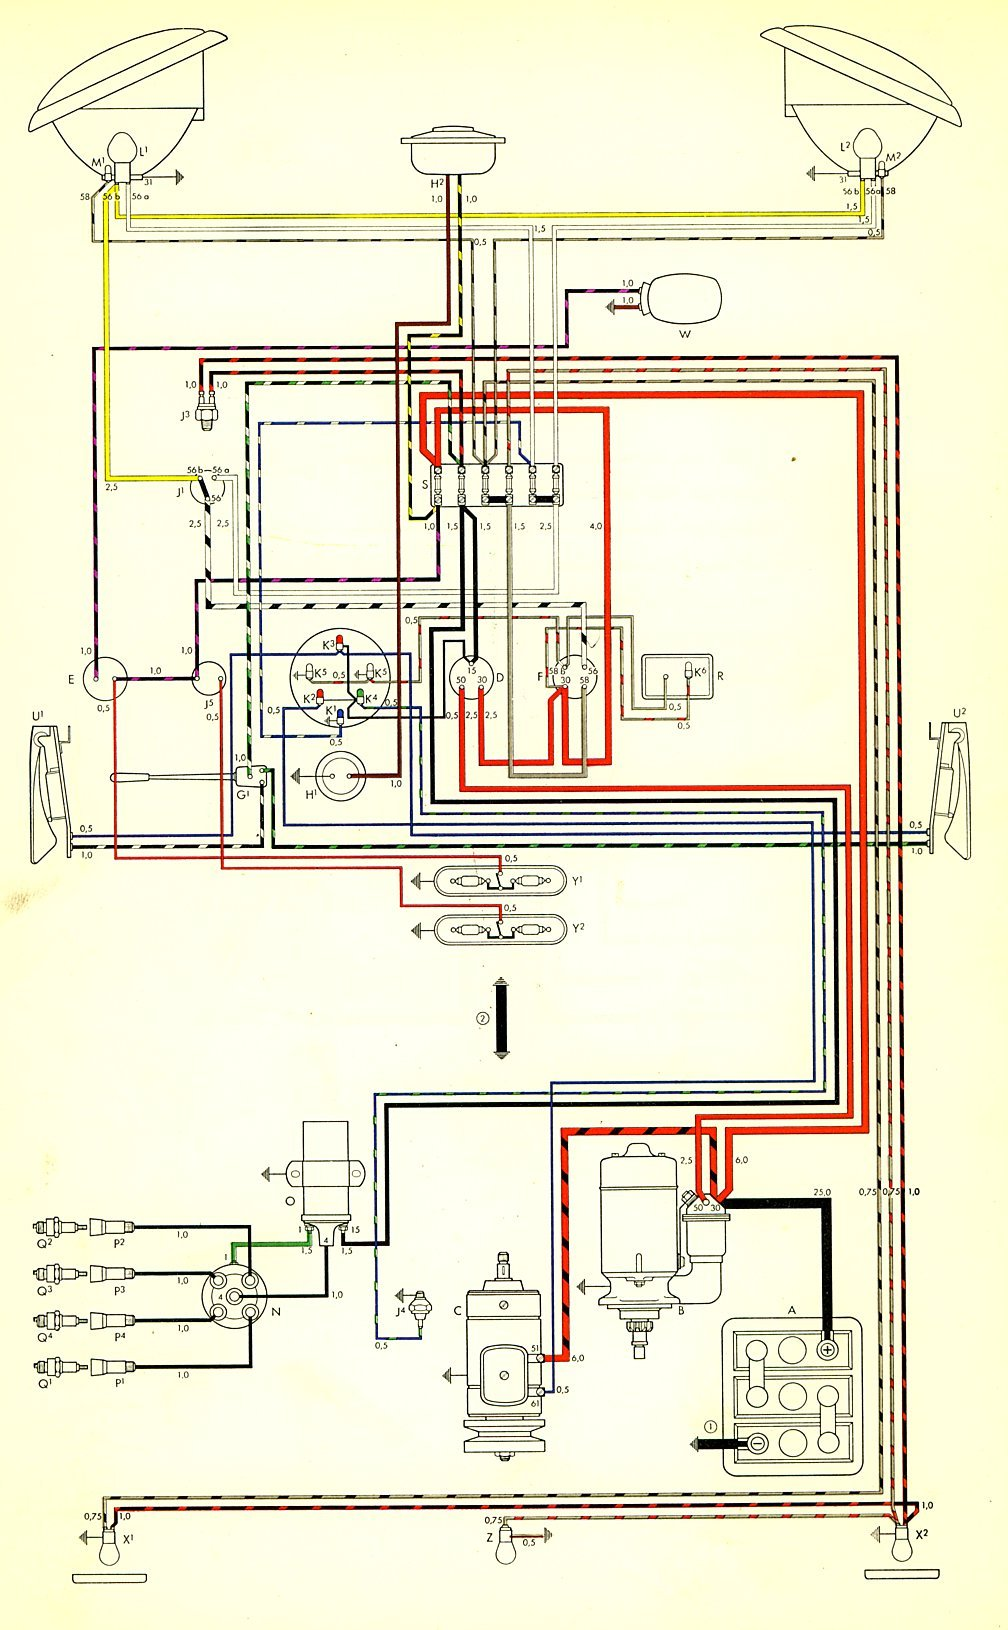 1980 Chevy Heater Wiring 1959 Bus Wiring Diagram Thegoldenbug Com